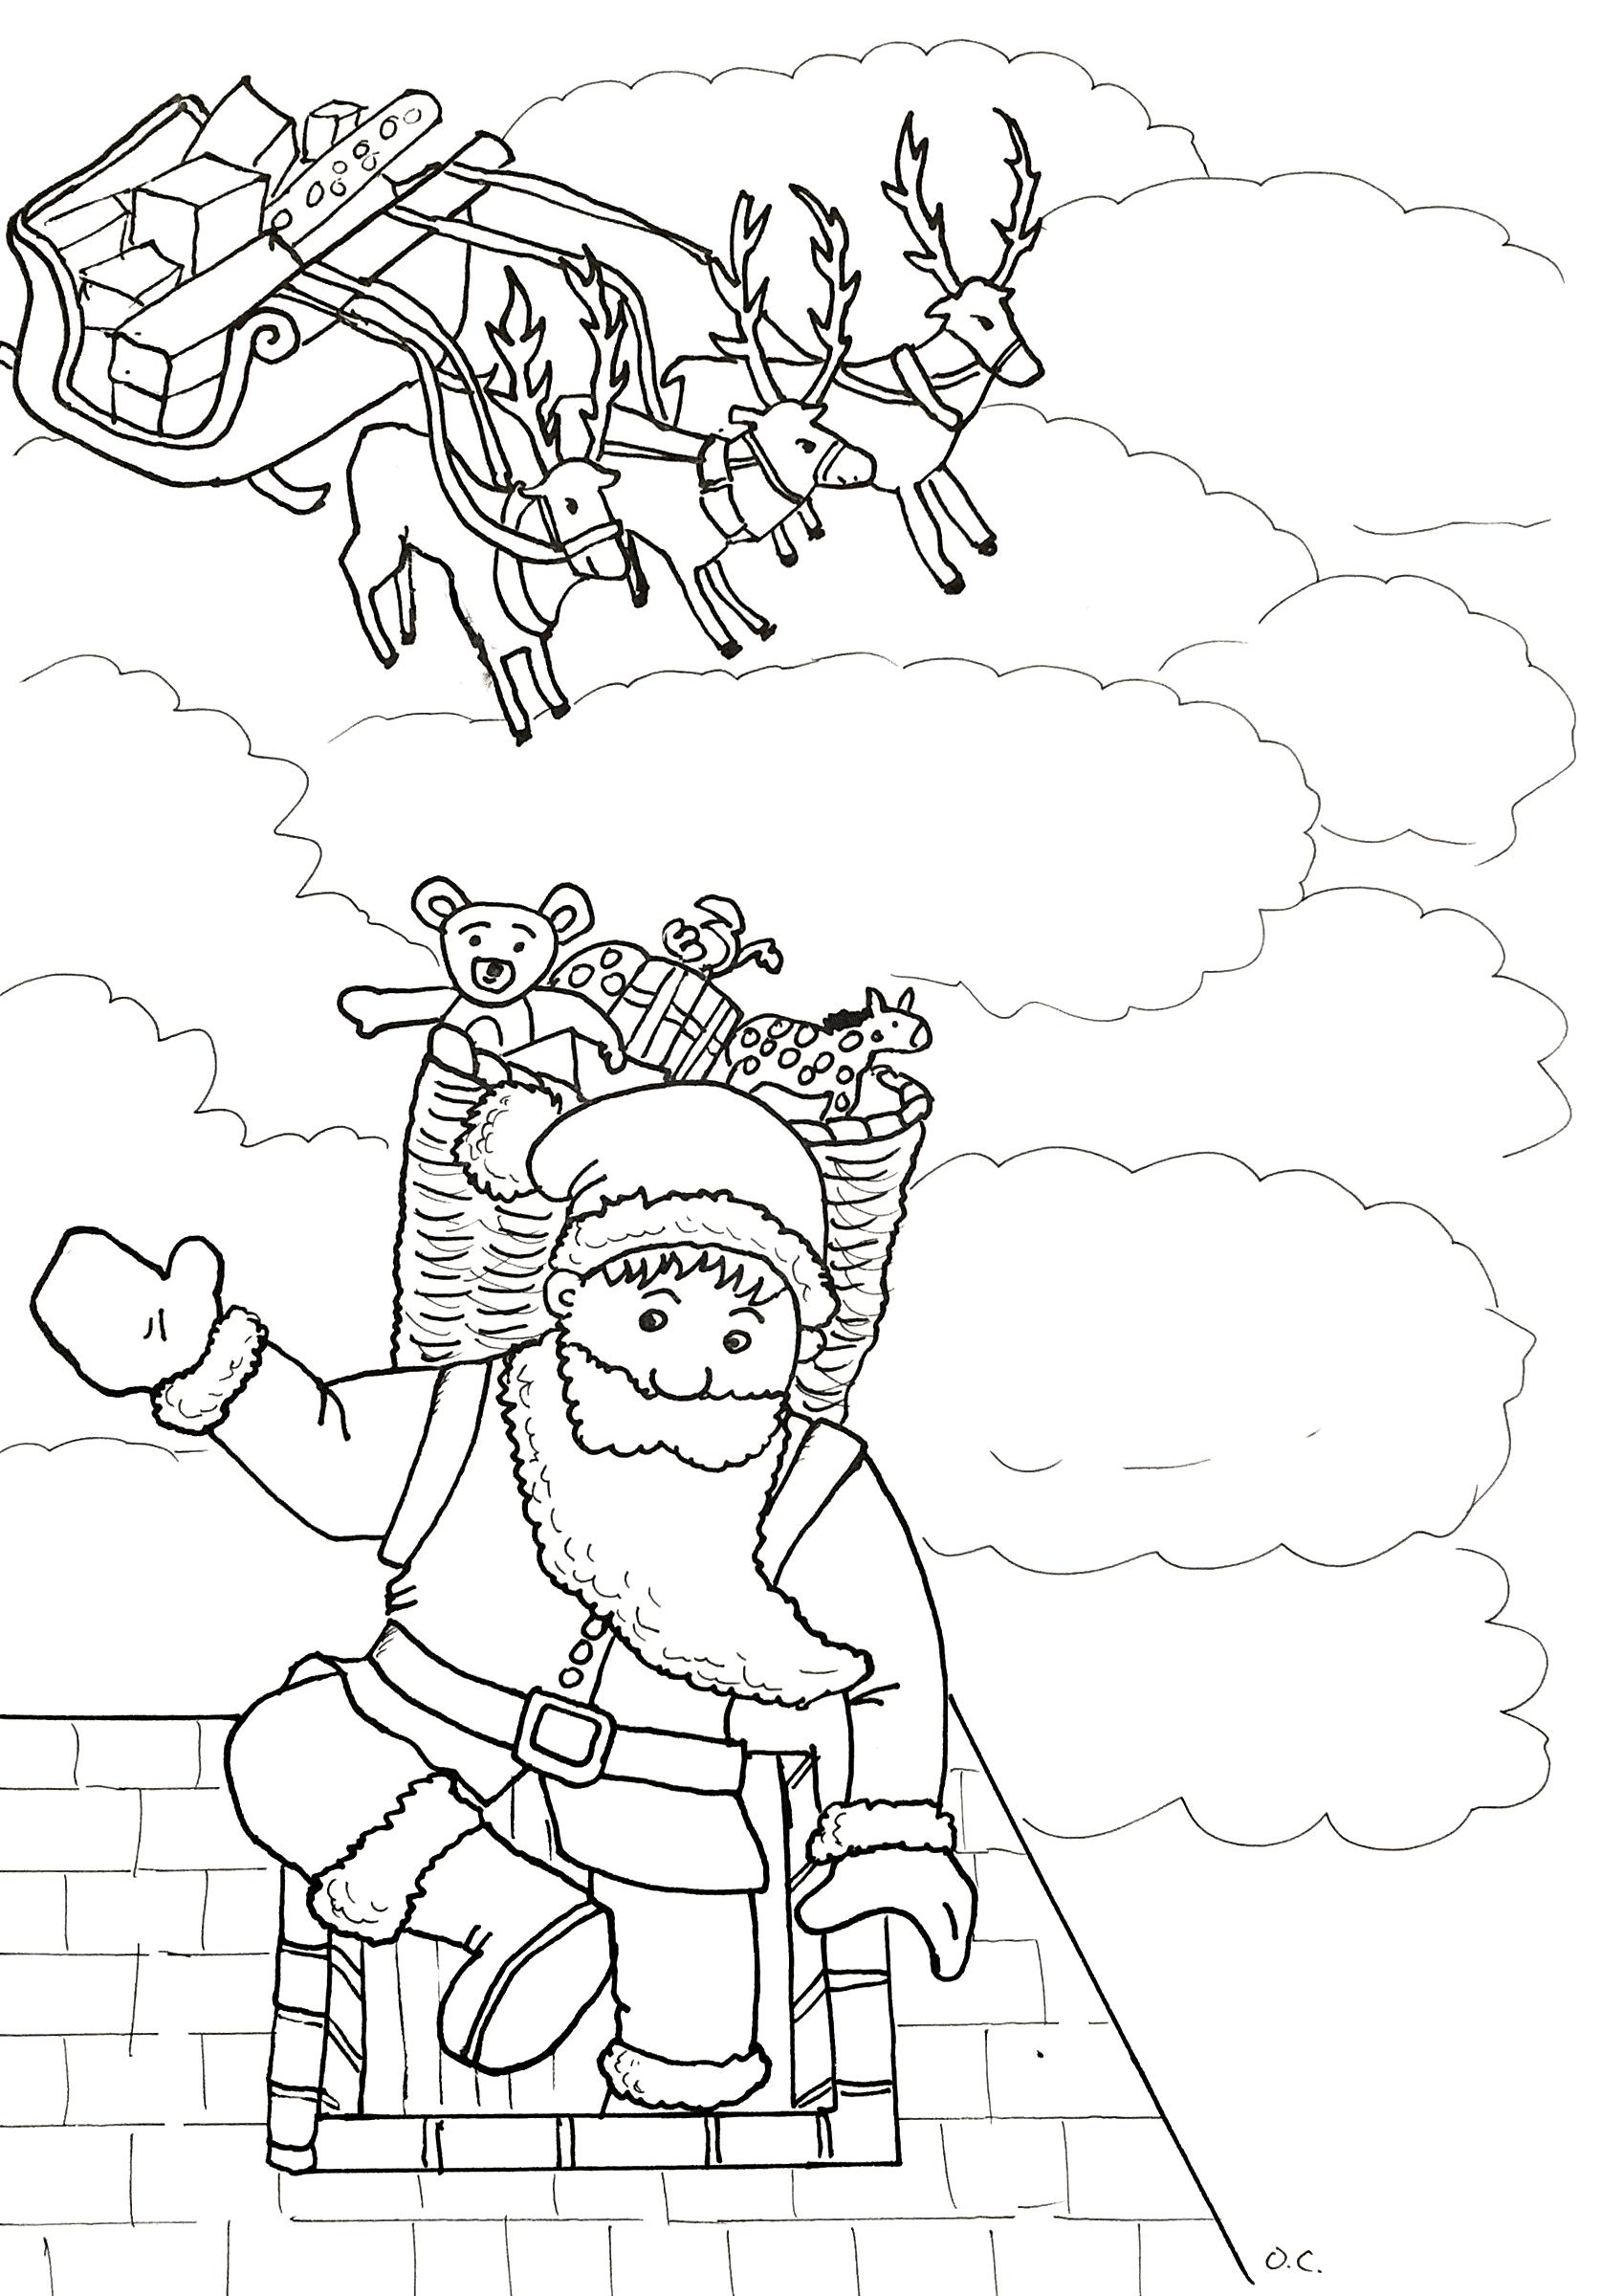 Natale - 23